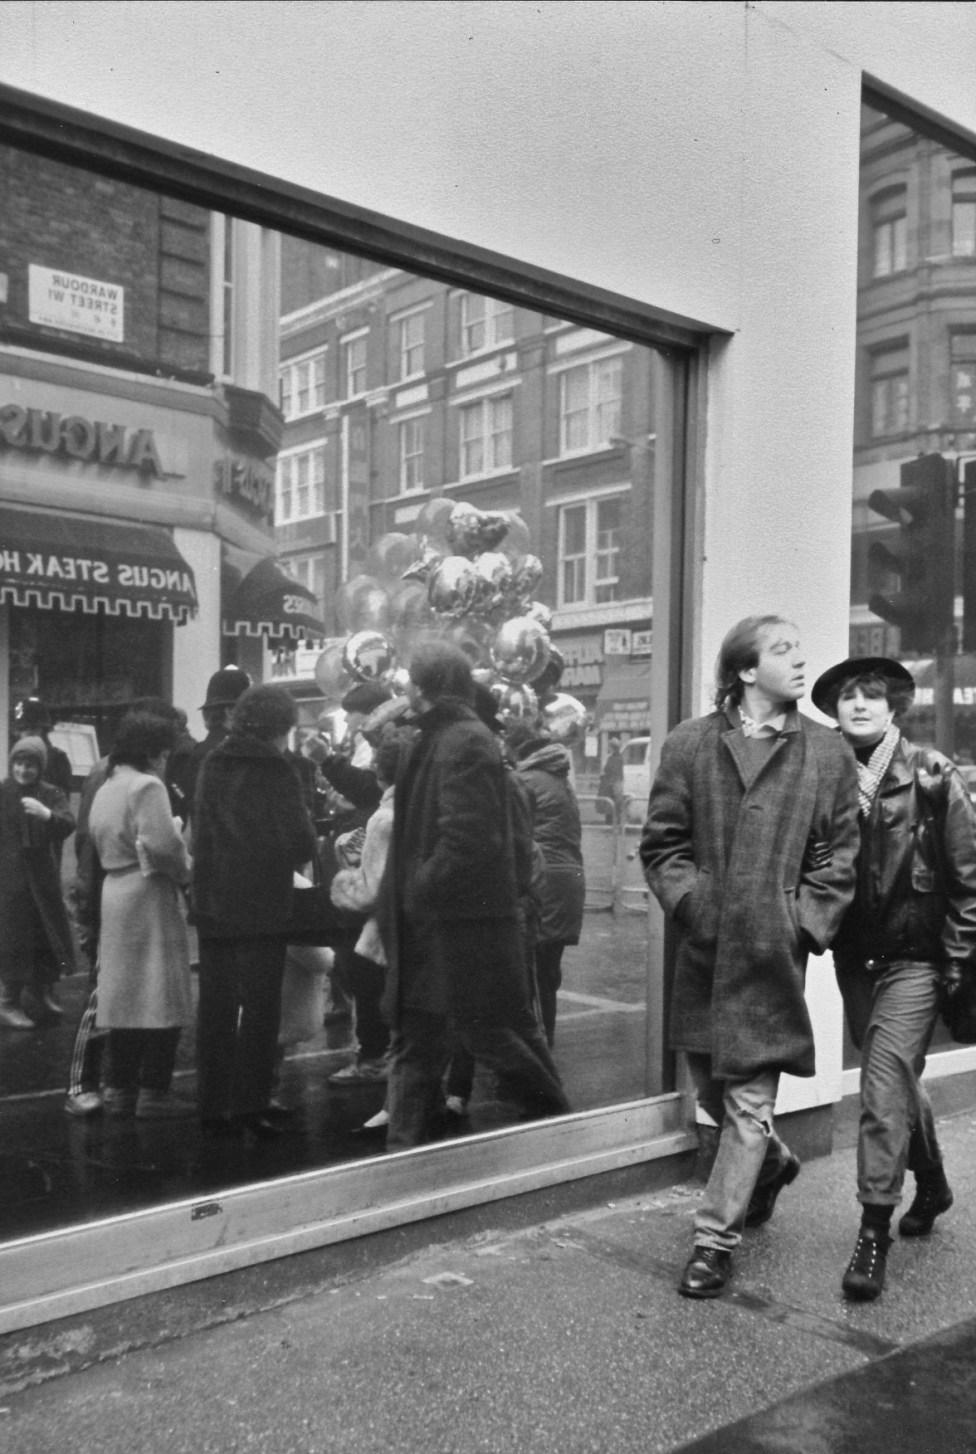 Chinatown, London 1980s